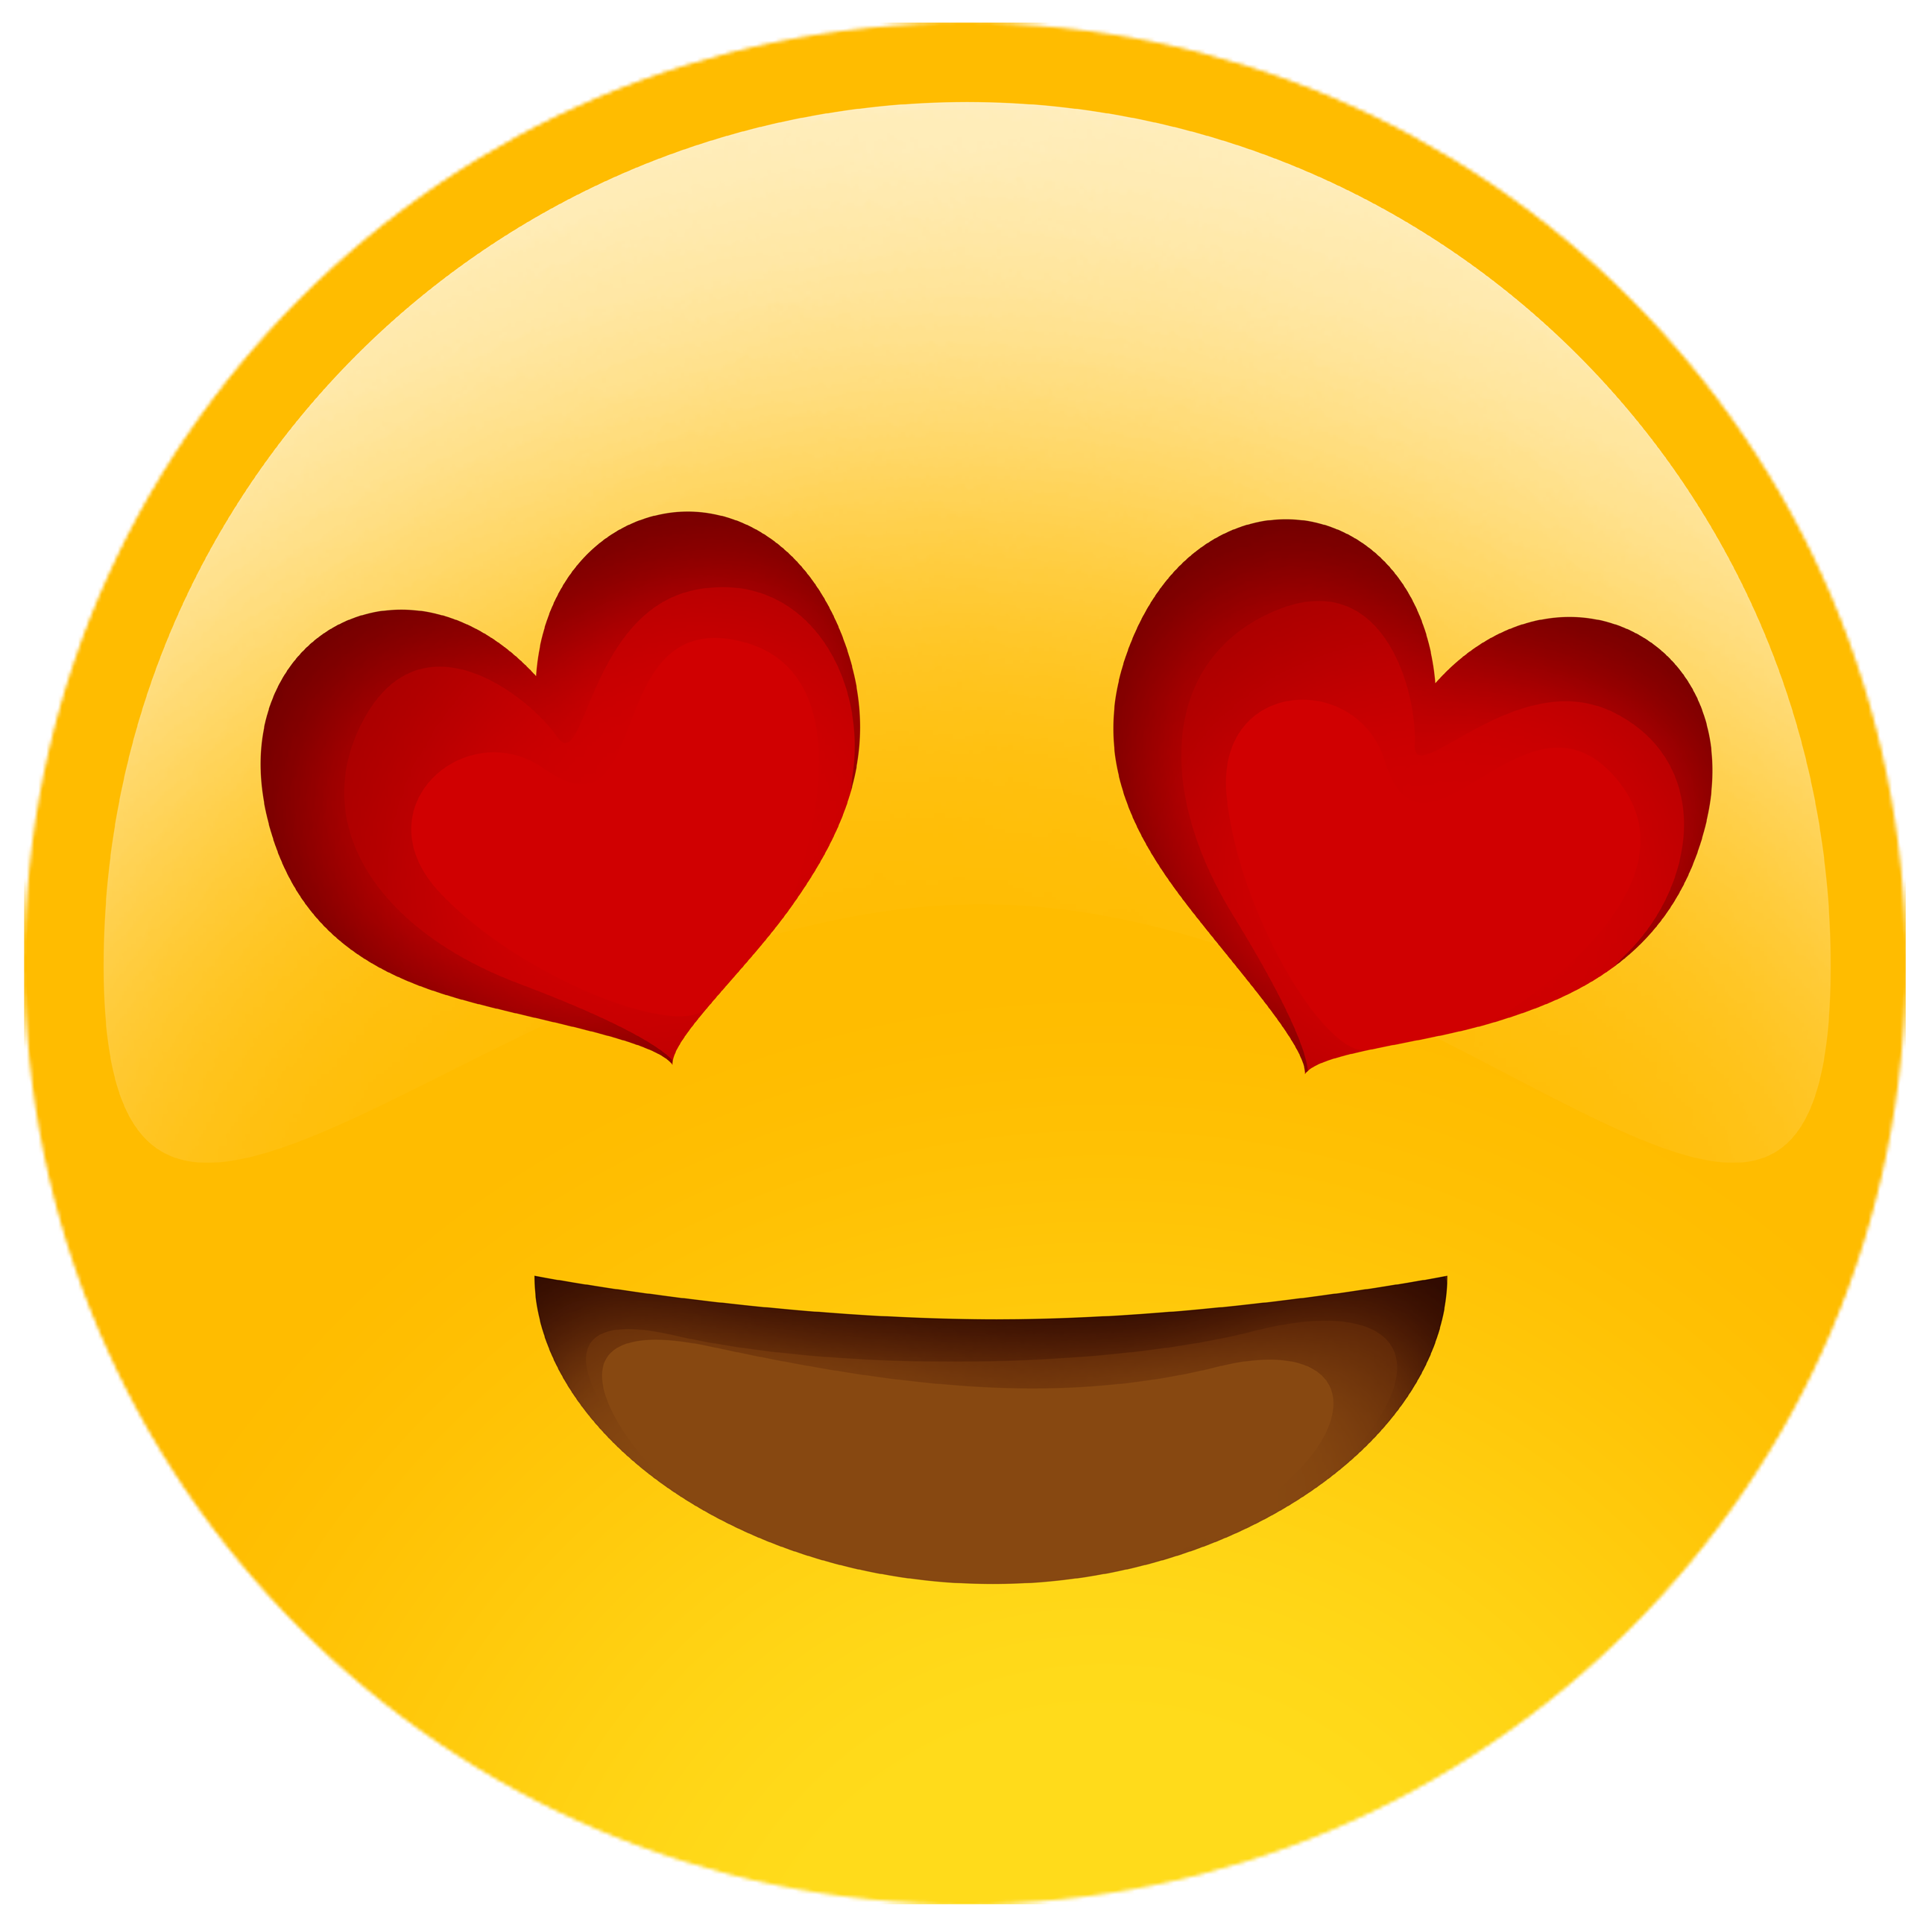 20 Heart eye emoji clipart for free download on Premium art.